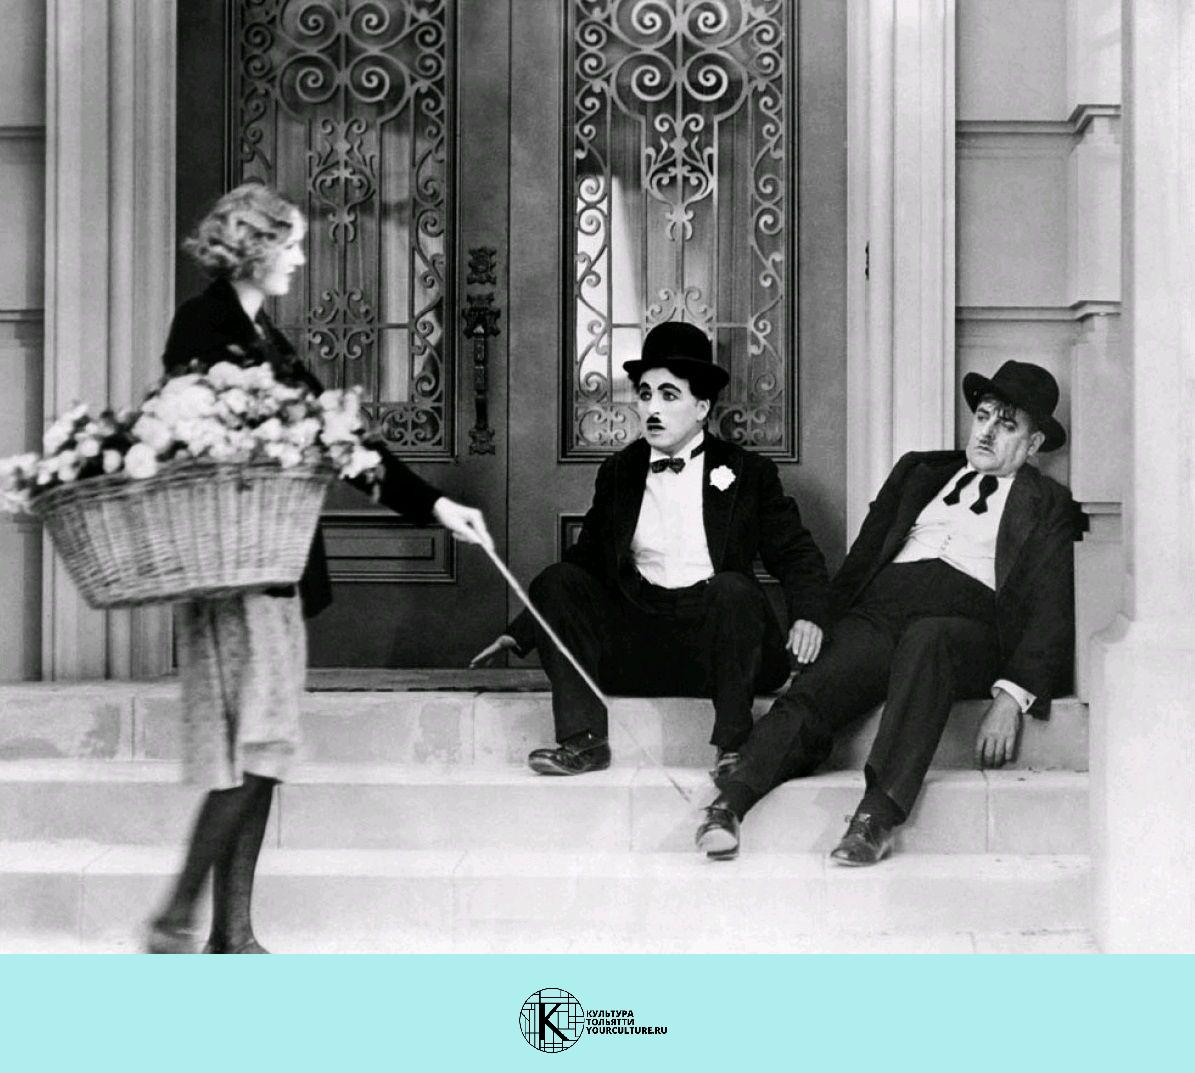 Ч. Чаплин «Огни большого города»